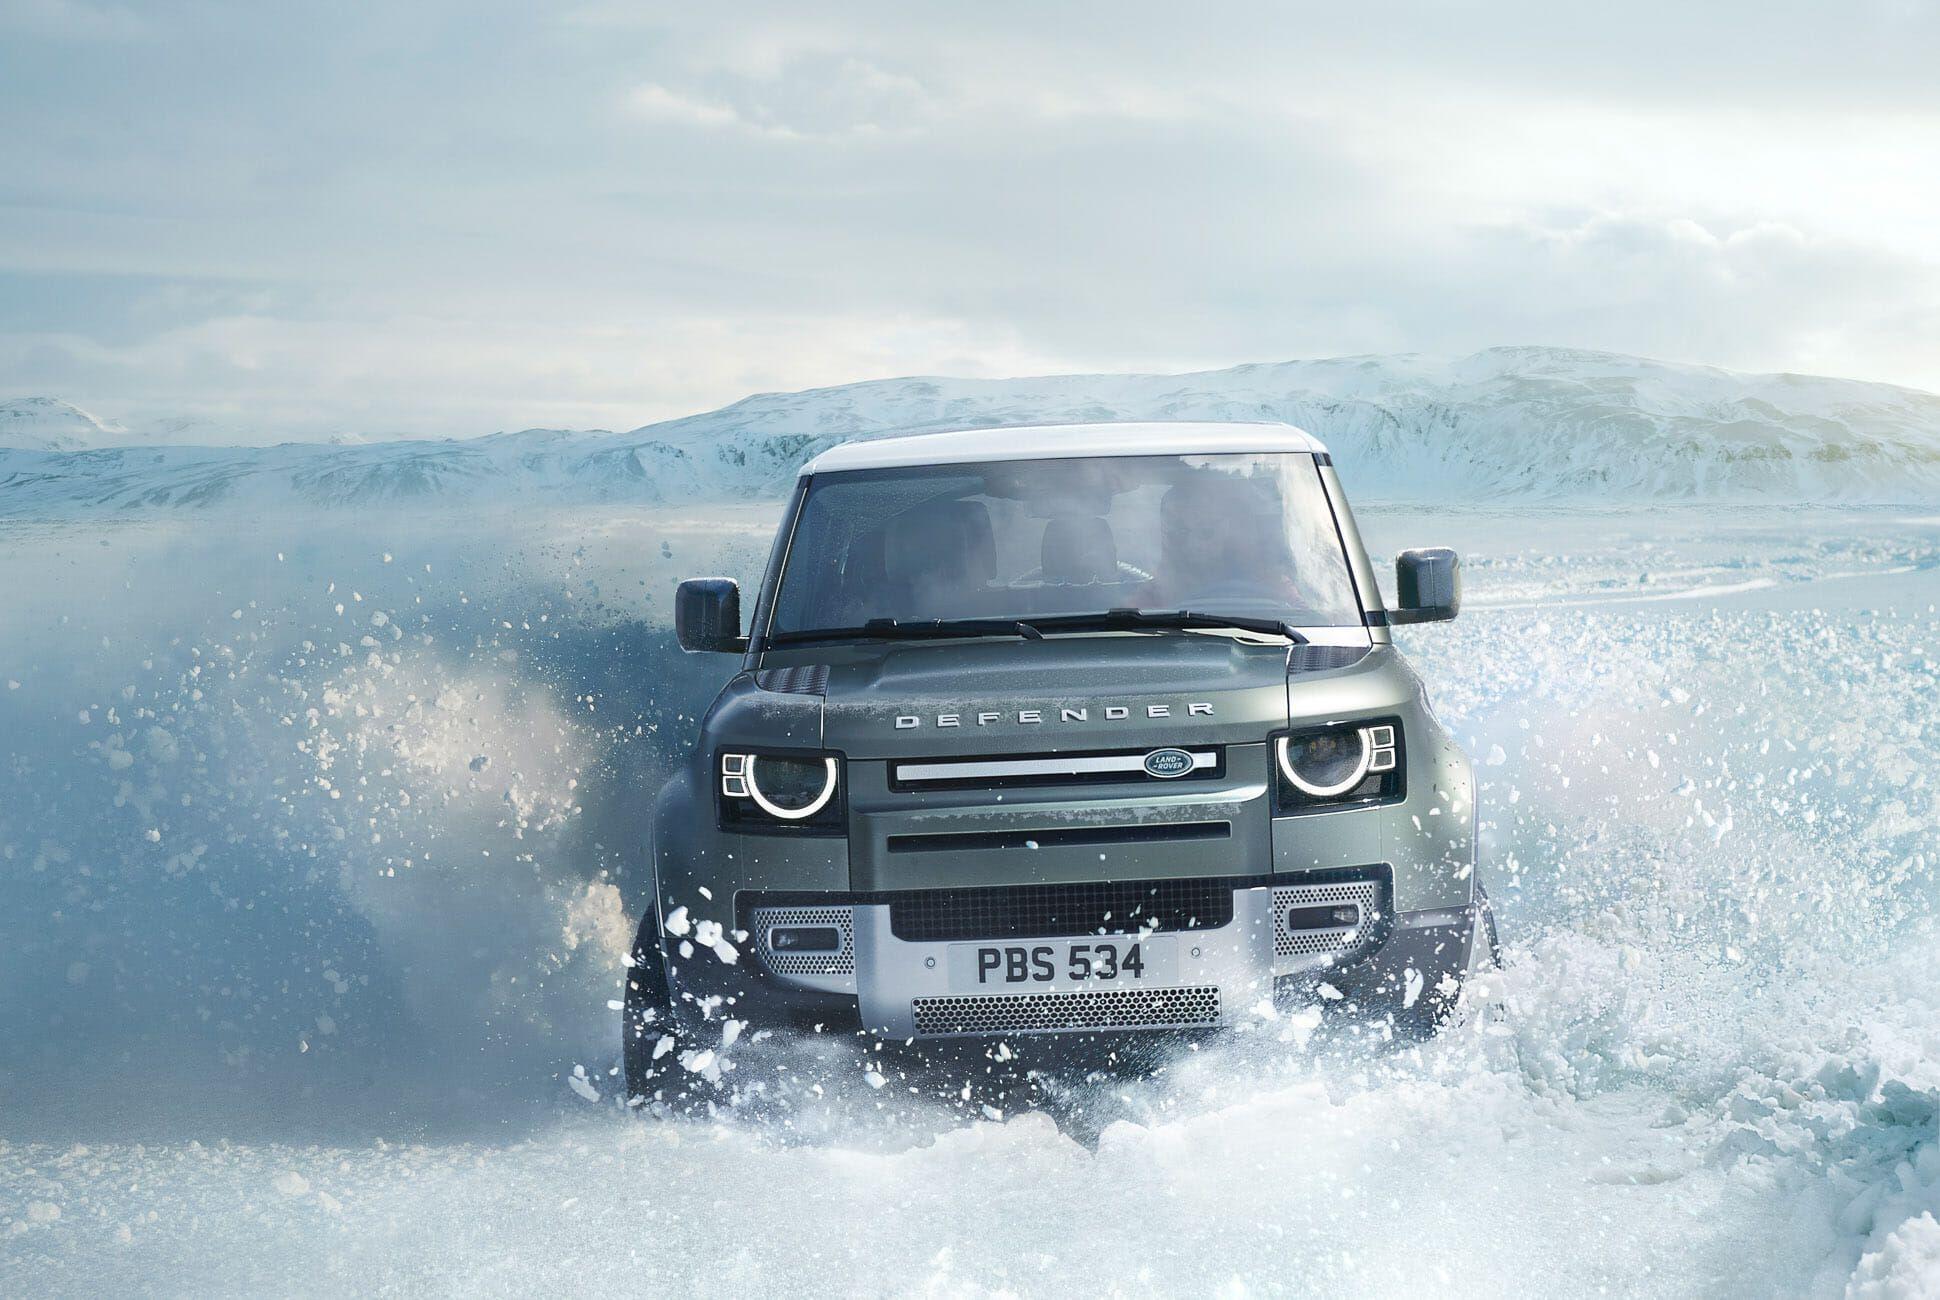 Land Rover Defender Gear Patrol-Exterior Action-Slide-09